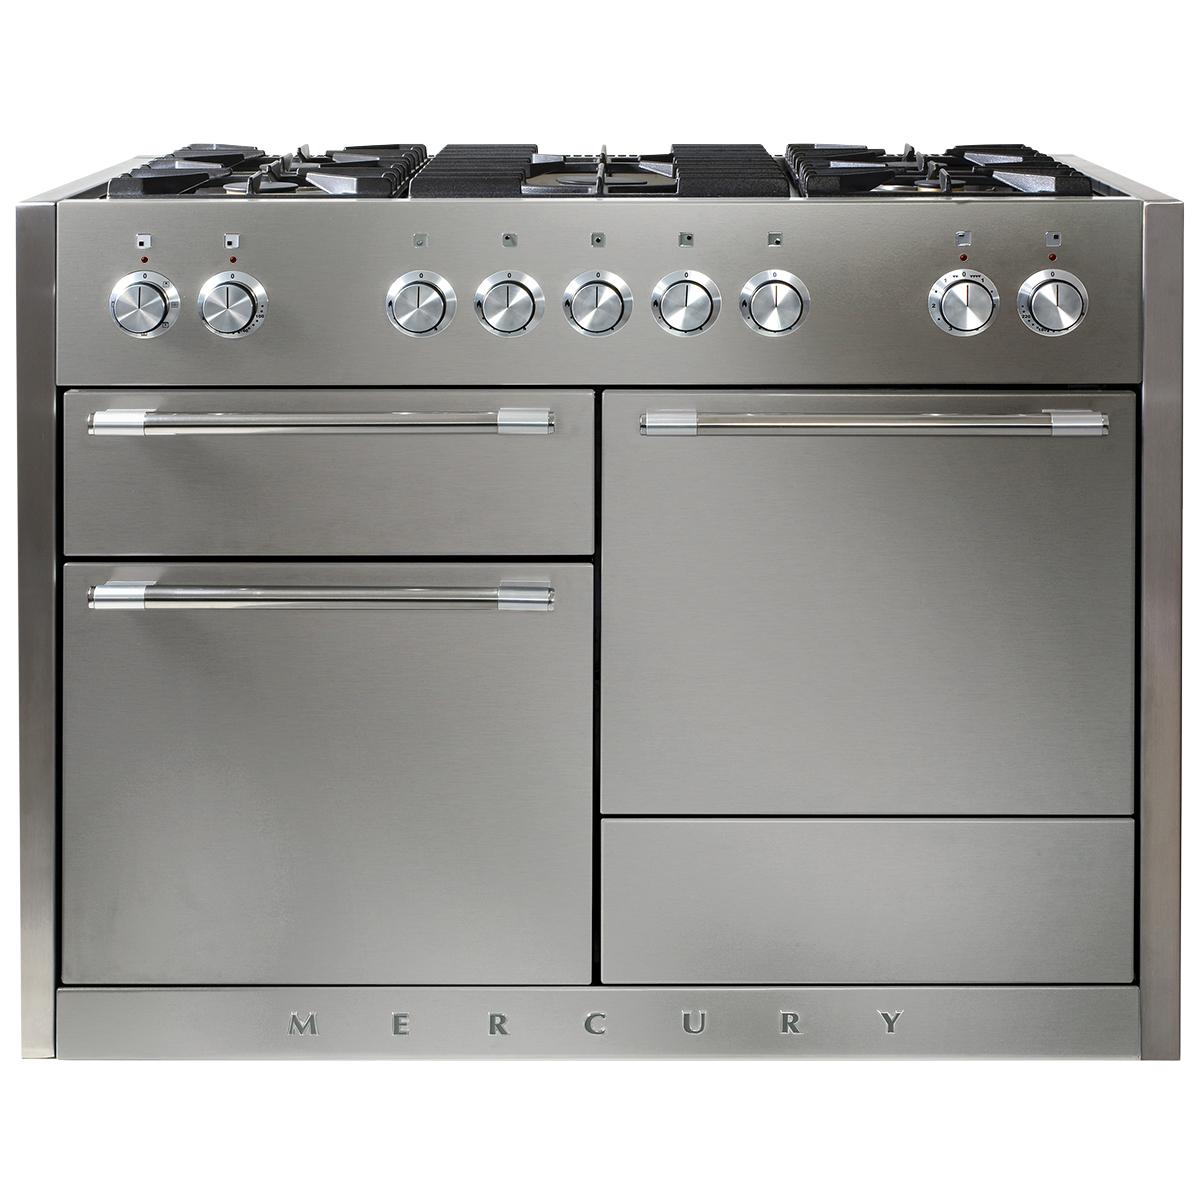 Incroyable Au0026A Appliance Solutions Distributor